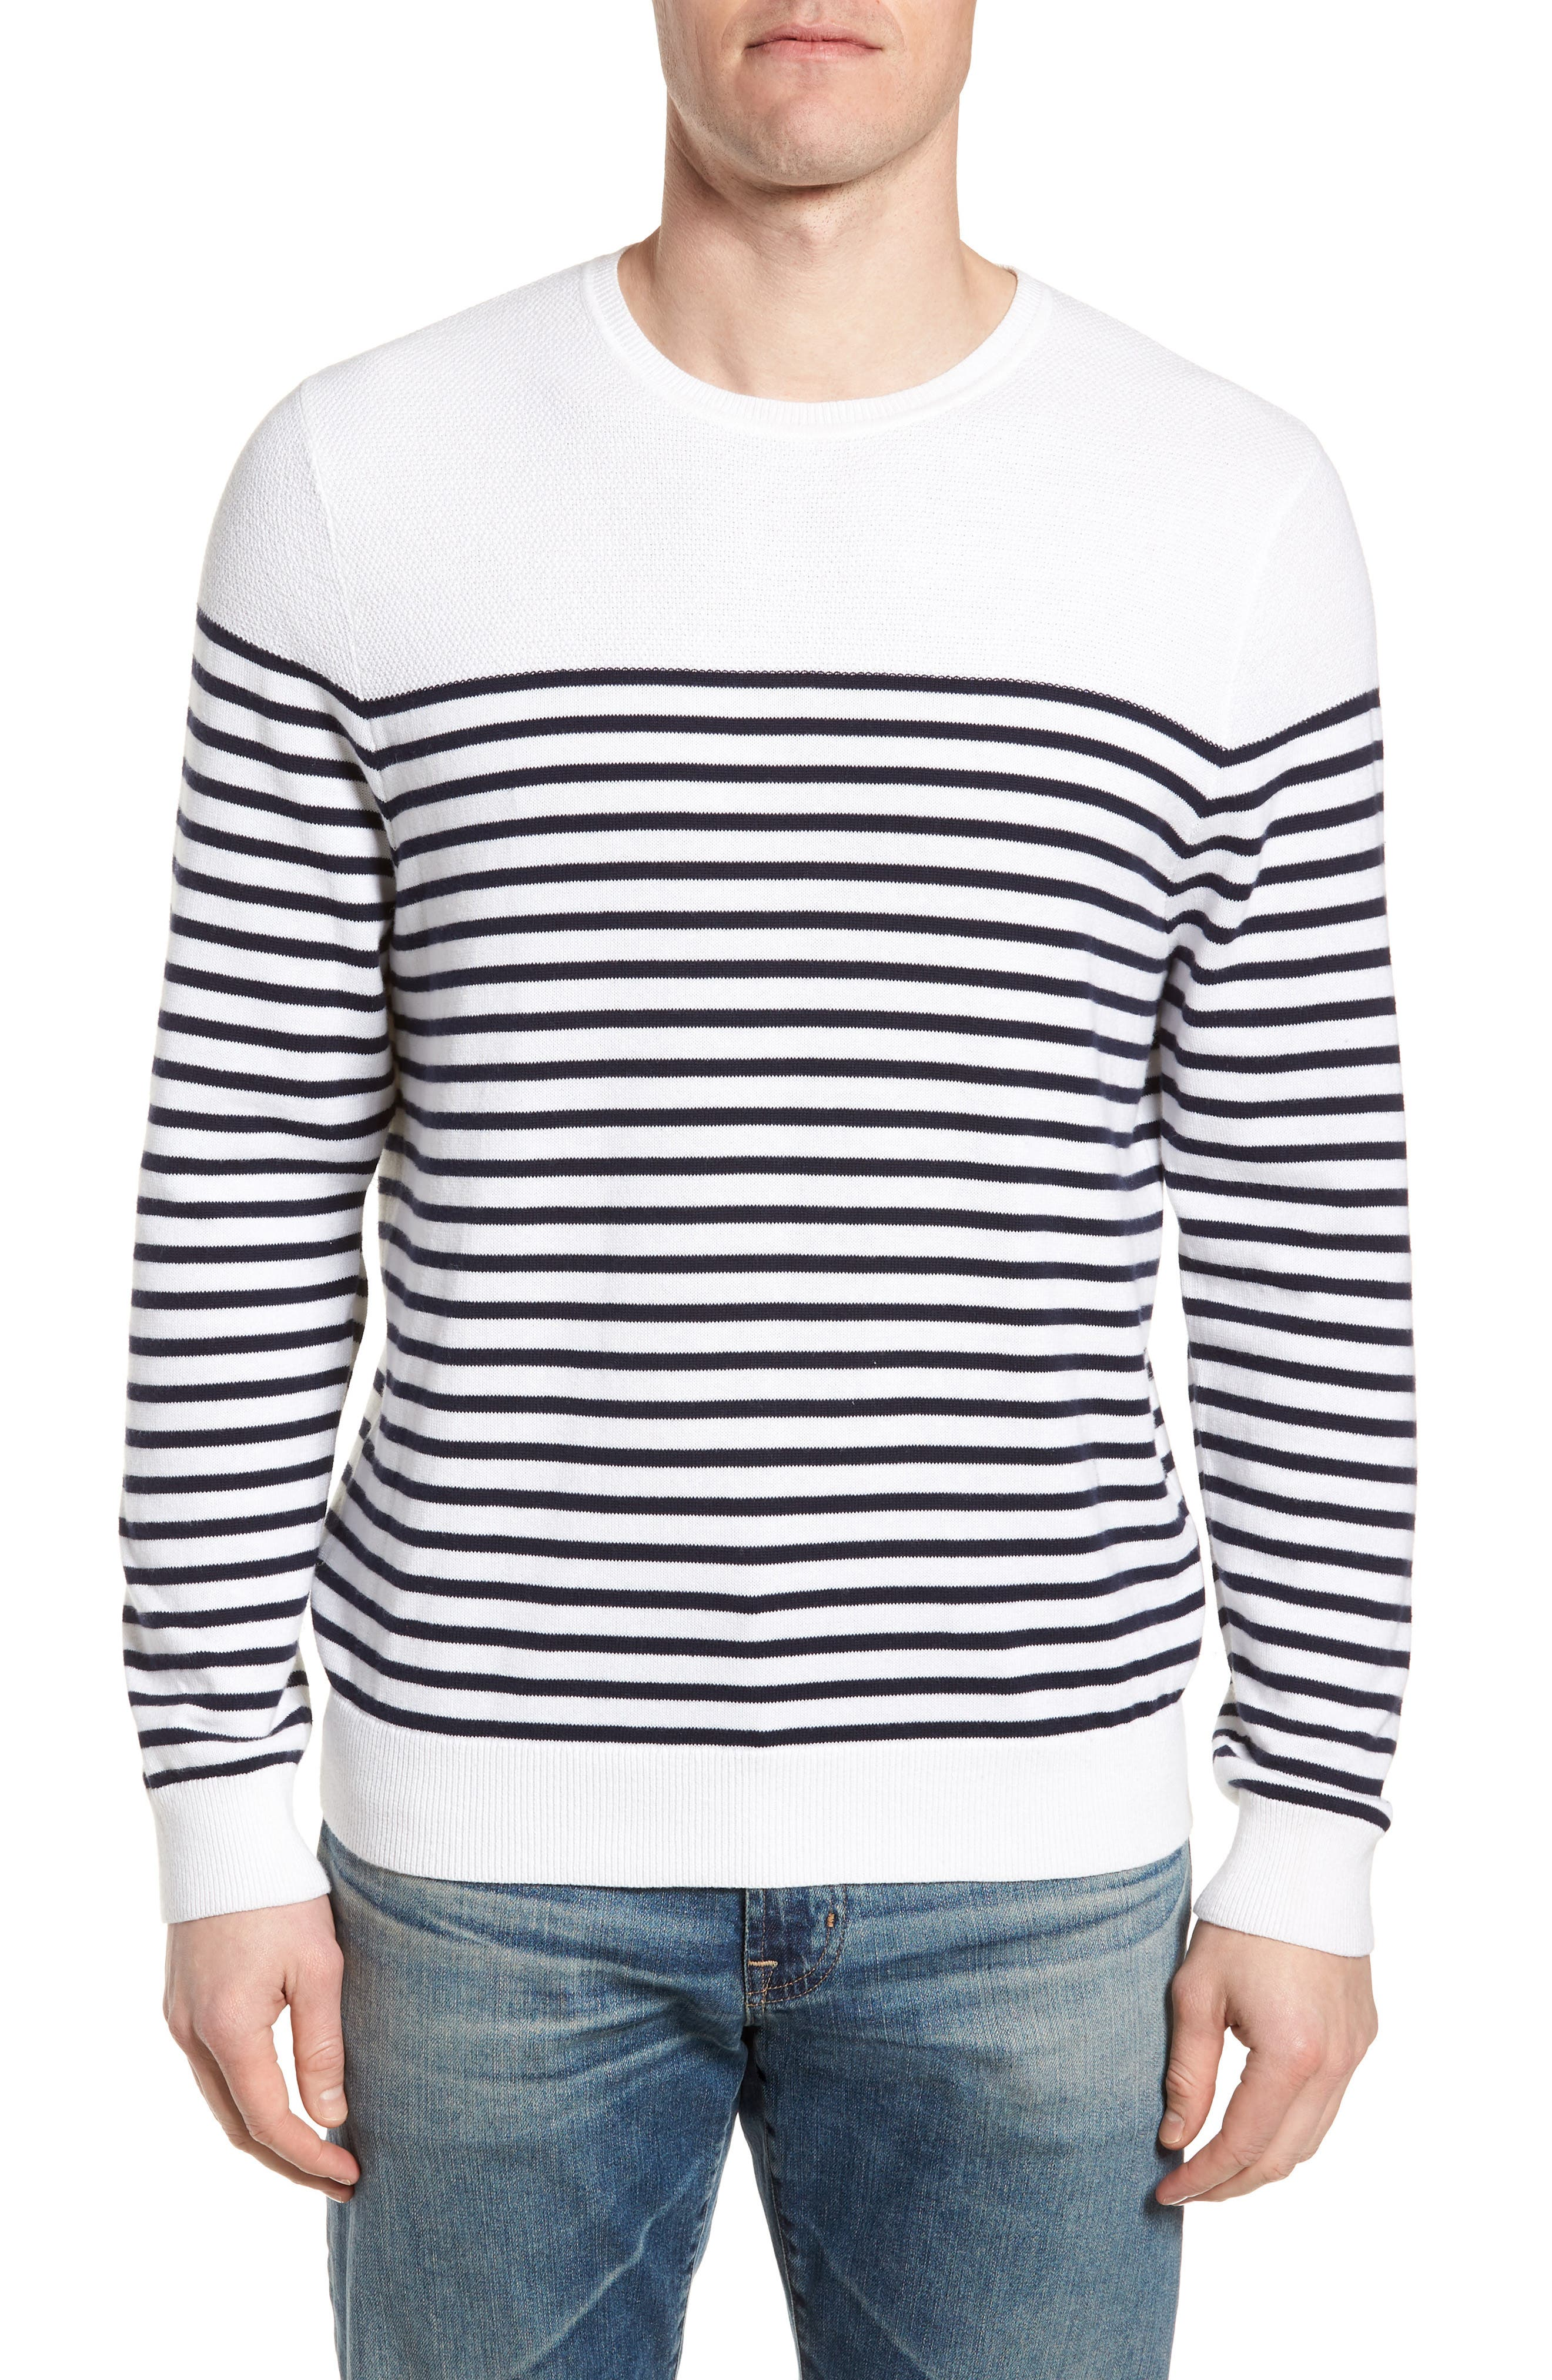 Breton Stripe Sweater,                         Main,                         color, White Navy Stripe